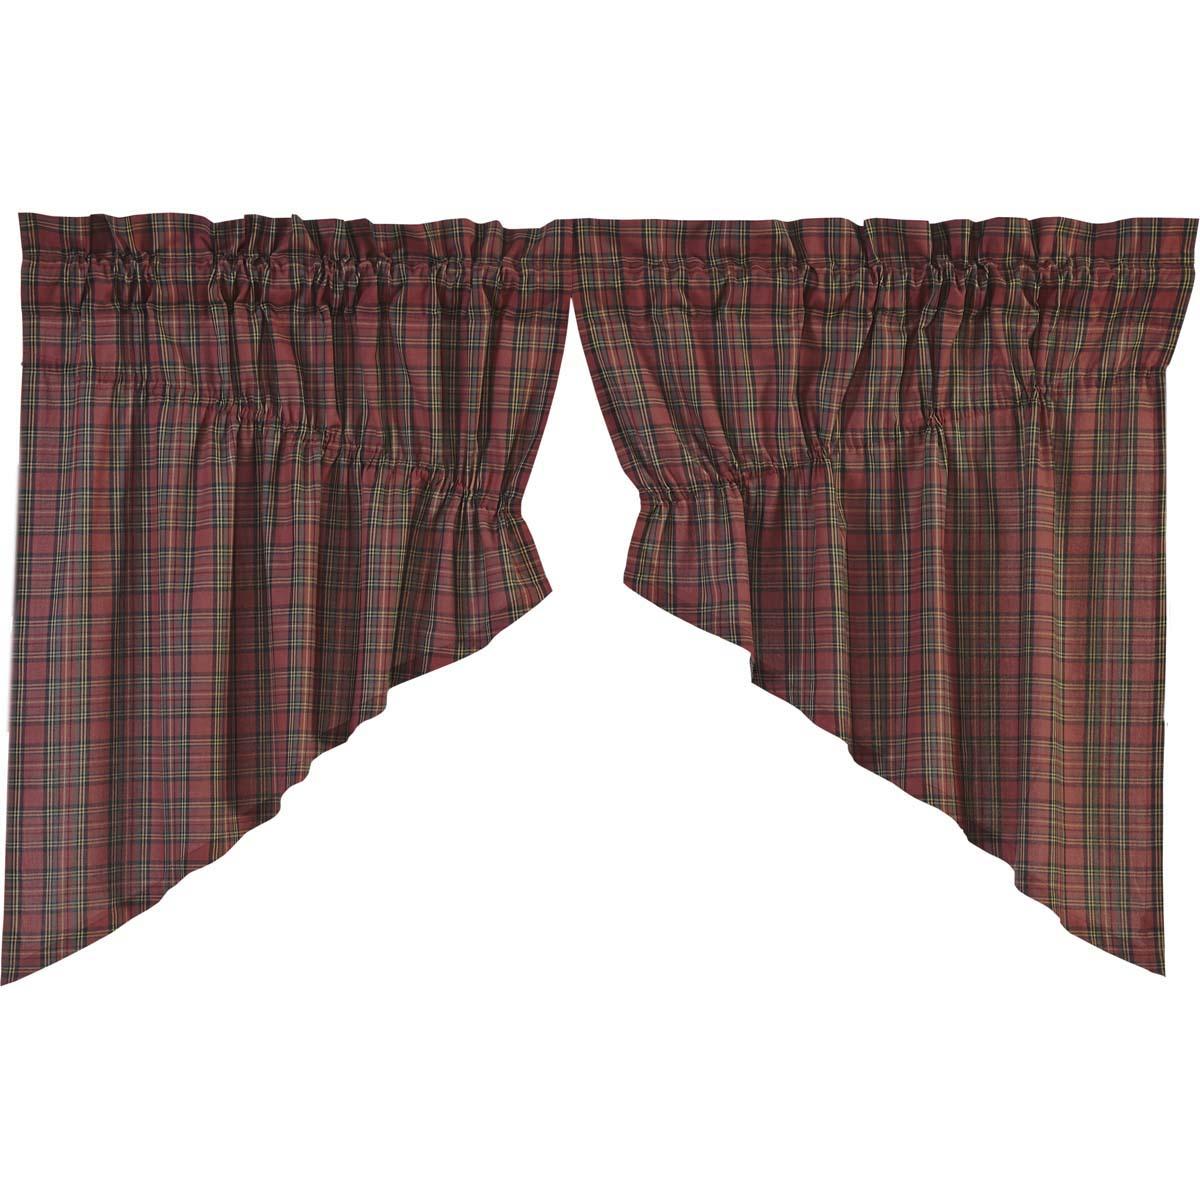 Tartan Red Plaid Prairie Swag Set of 2 36x36x18